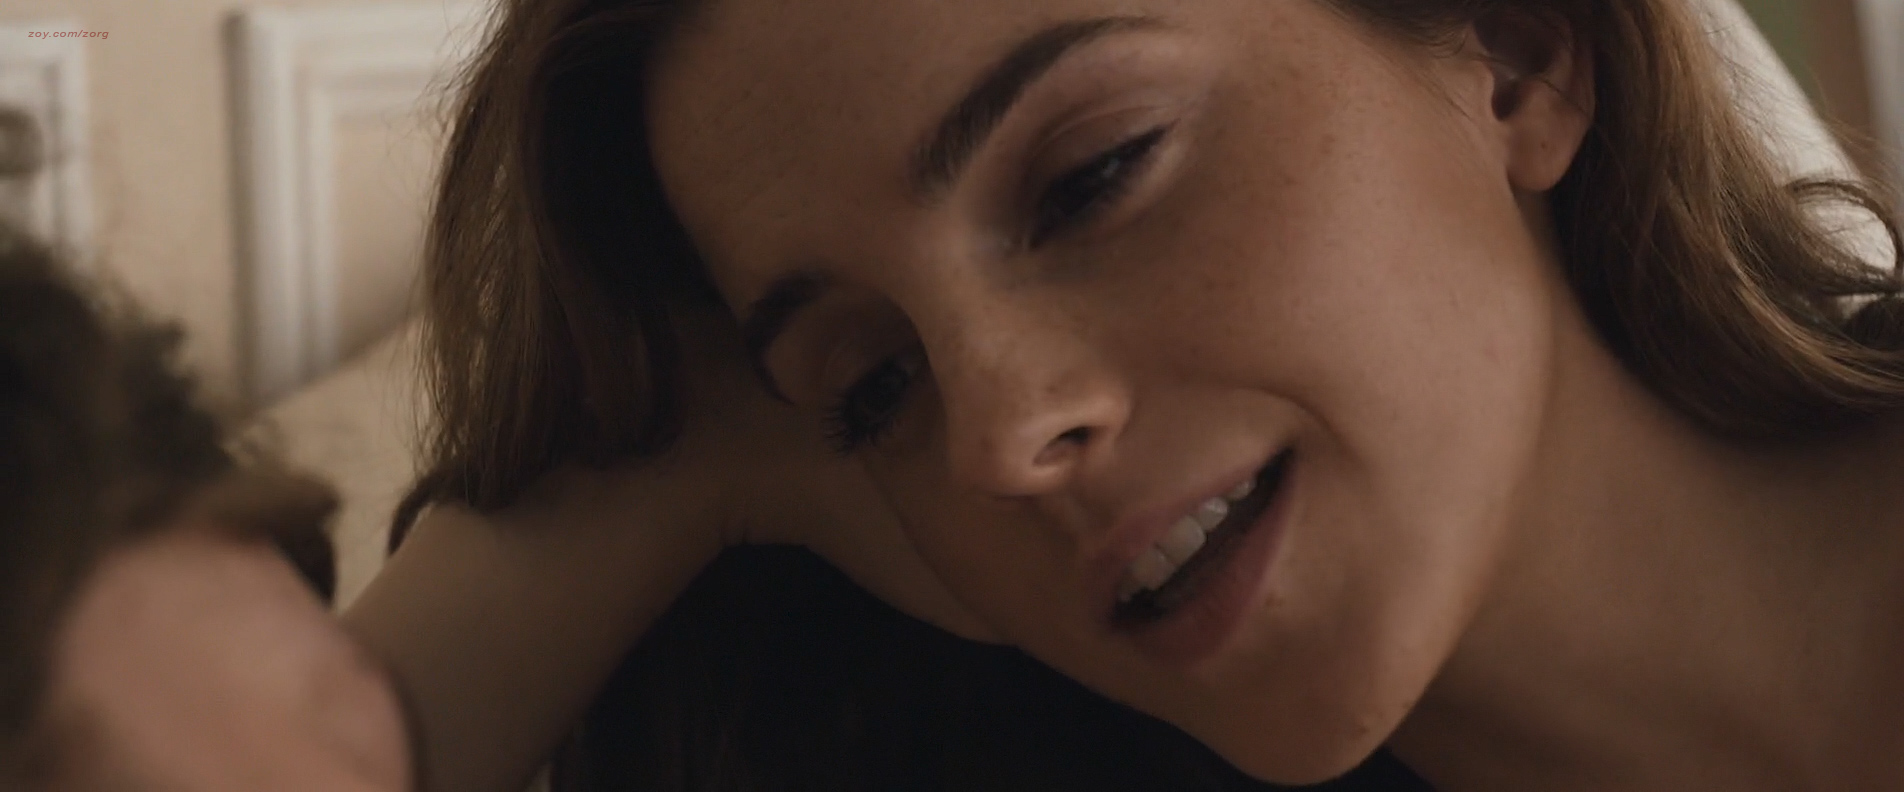 Emma Watson hot, sexy and leggy - Colonia (2015) HD 1080p WEB-DL (12)